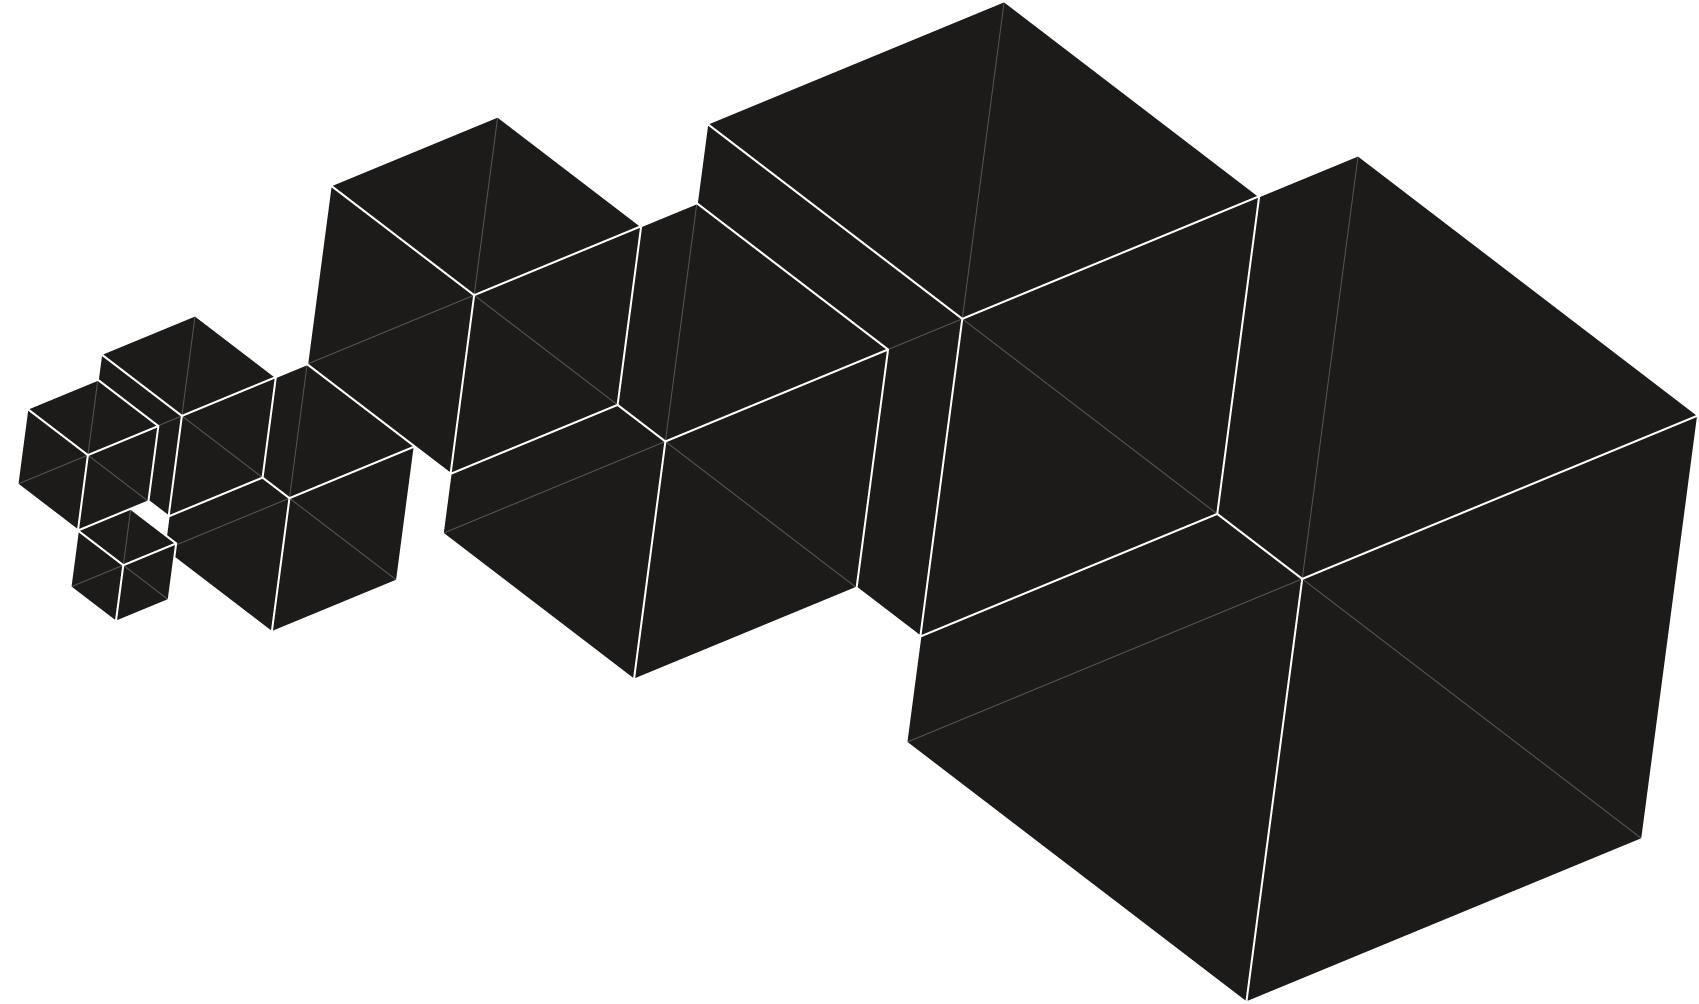 HEXAGONS_08.jpg